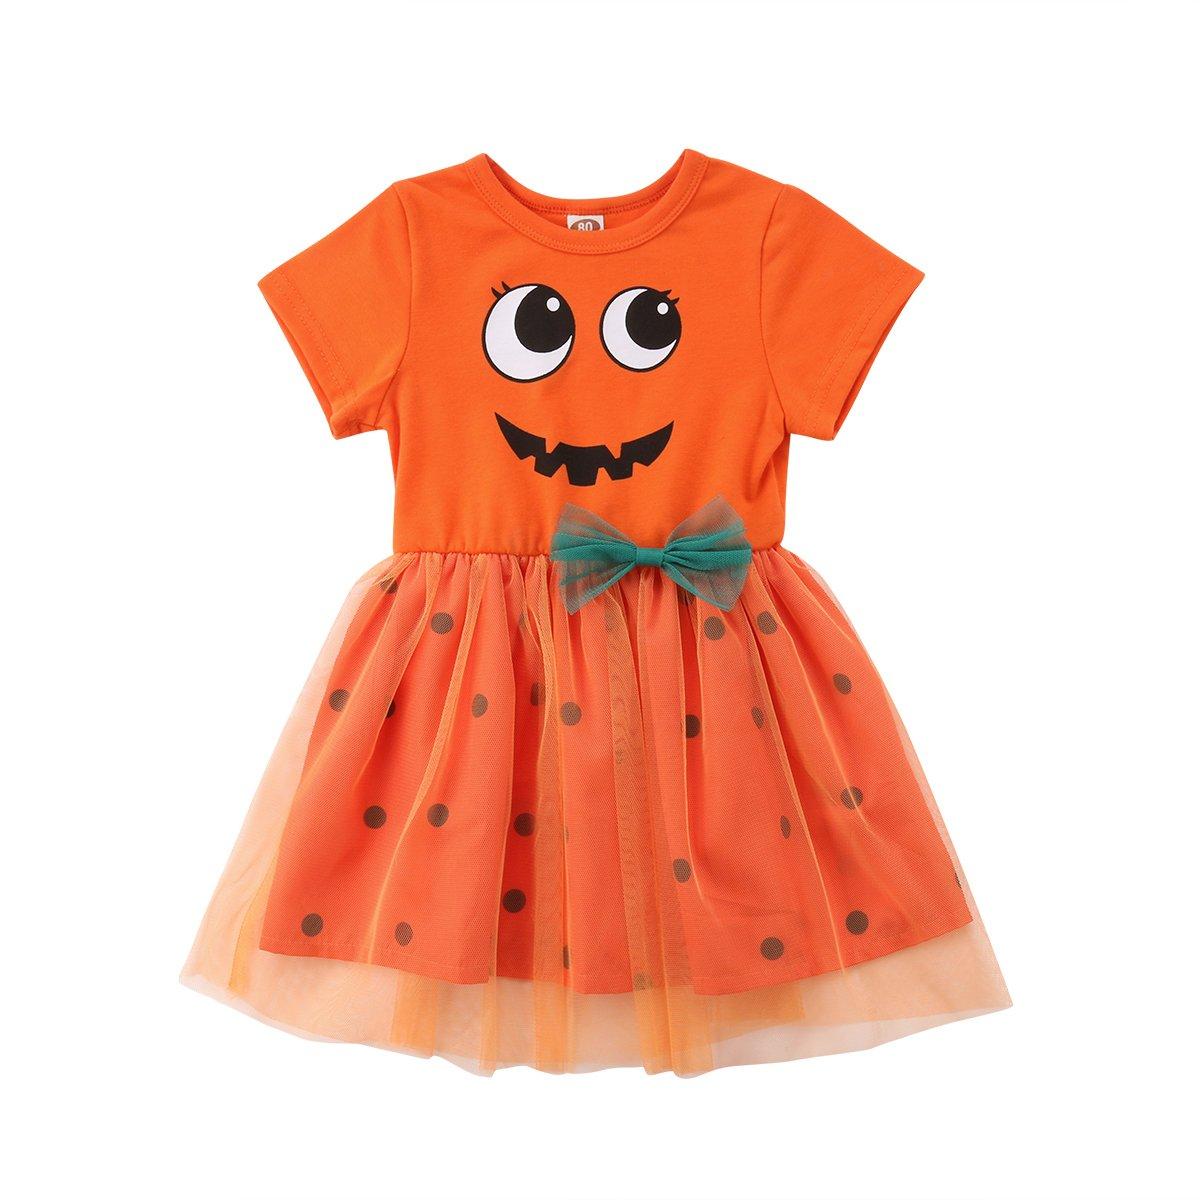 Toddler Baby Girl Halloween Clothes Pumpkin Short Sleeve Princess Dress Lace Tutu Skirt Outfits